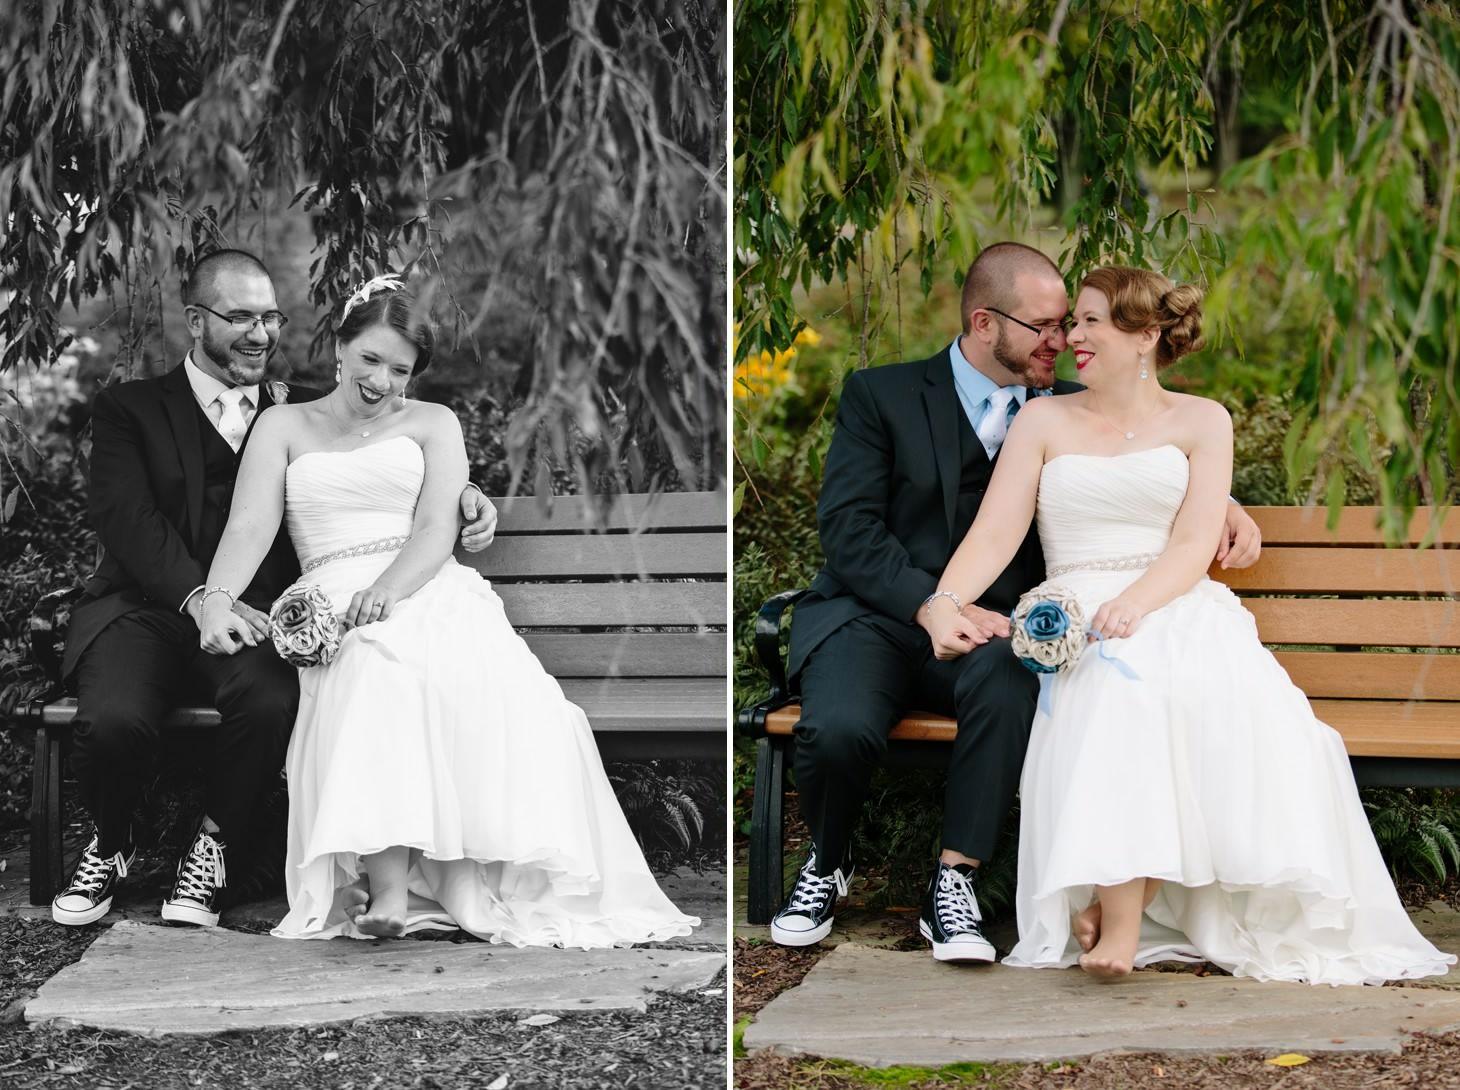 024-nyc-wedding-photographer-nj-nerdy-dr-who-firehouse-wedding-smitten-chickens.jpg